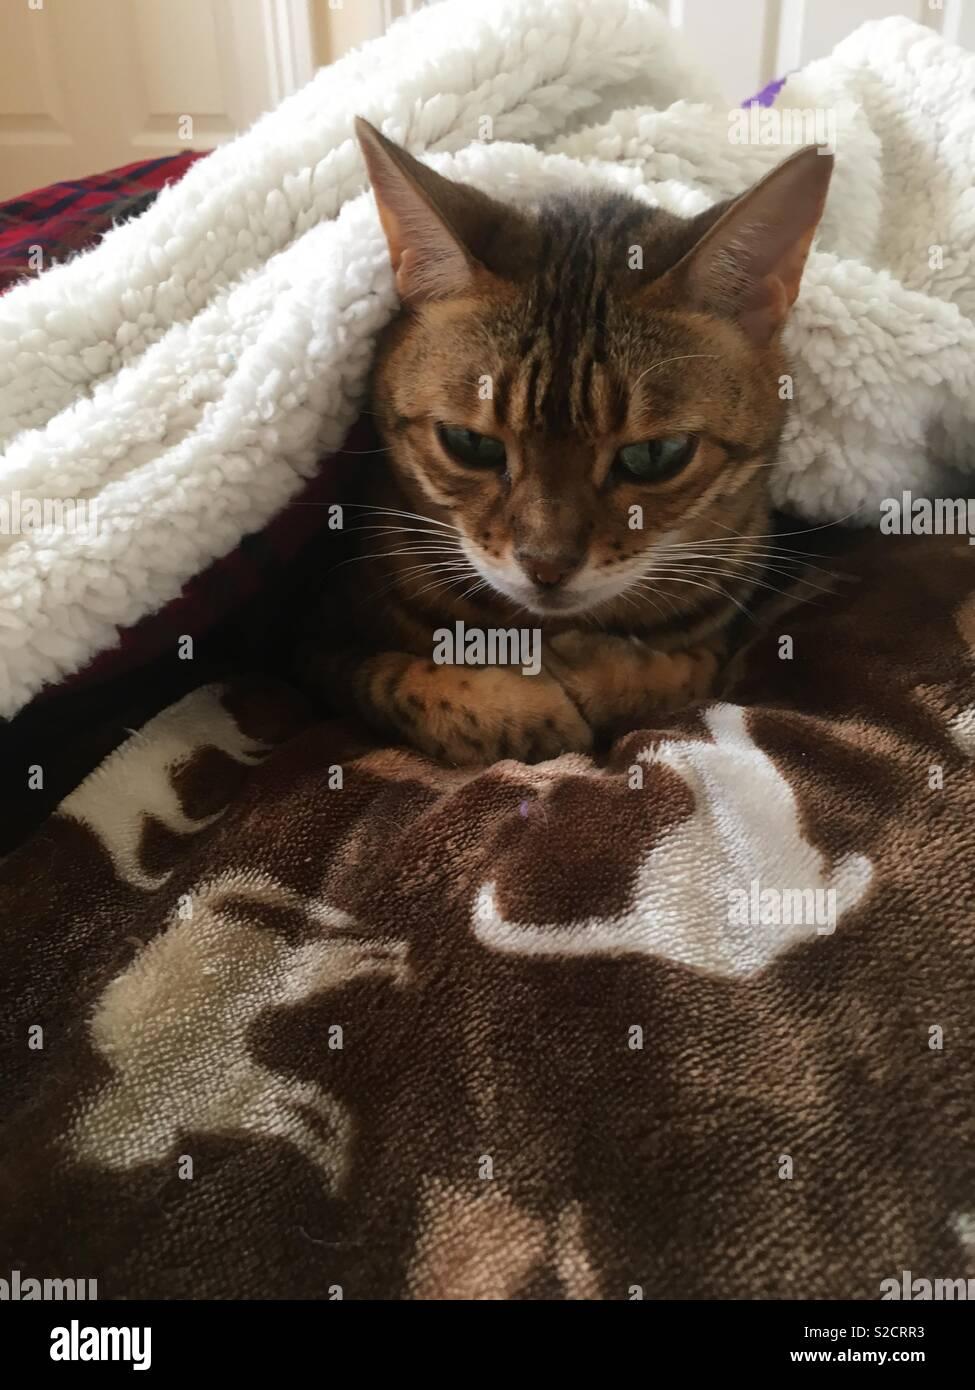 bengal cat images.html